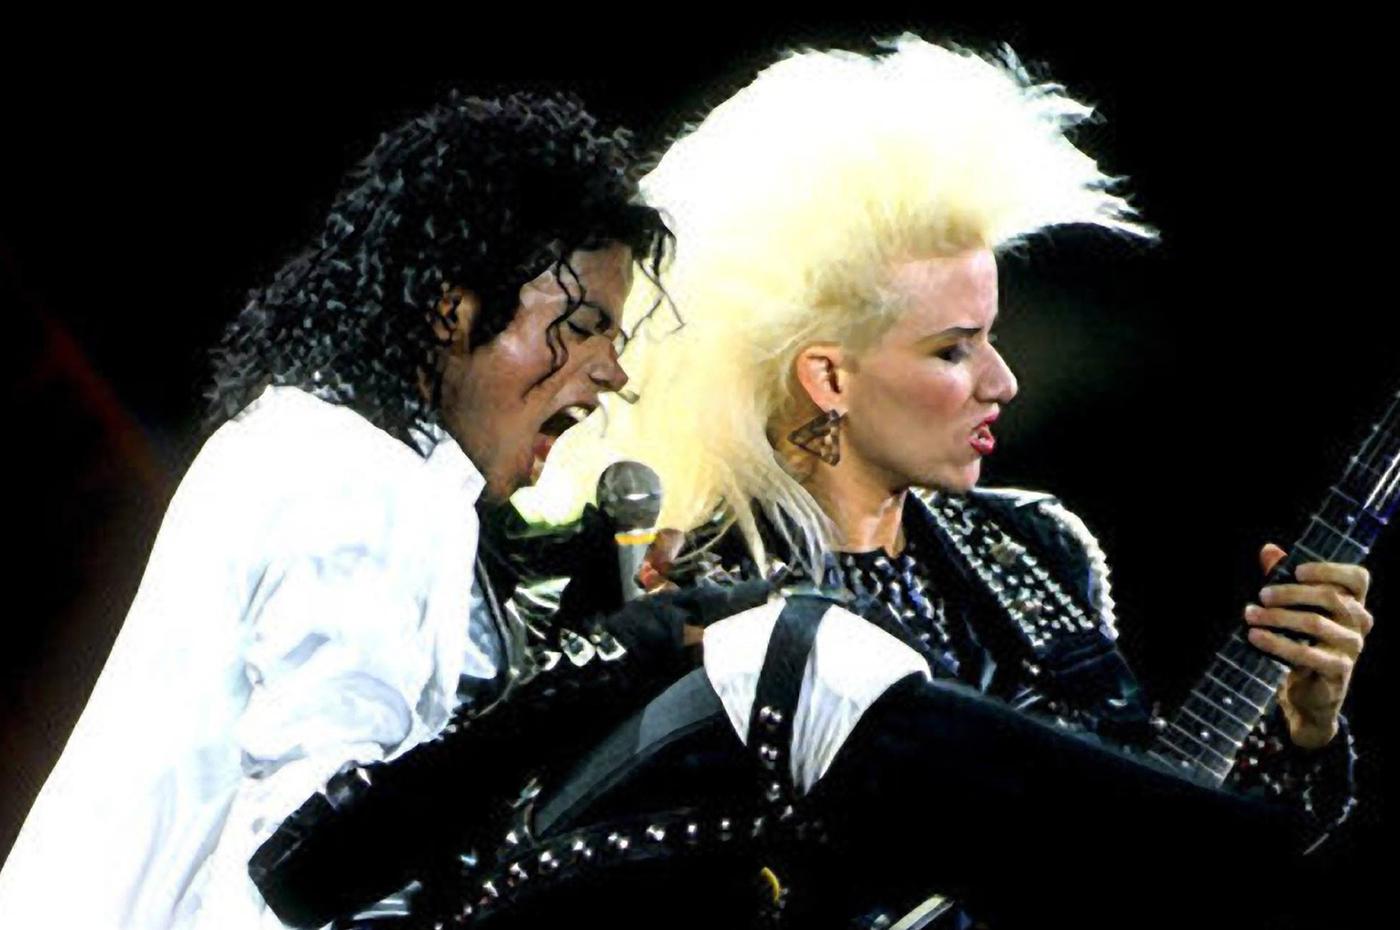 Jennifer Batten la exguitarrista de Michael Jackson